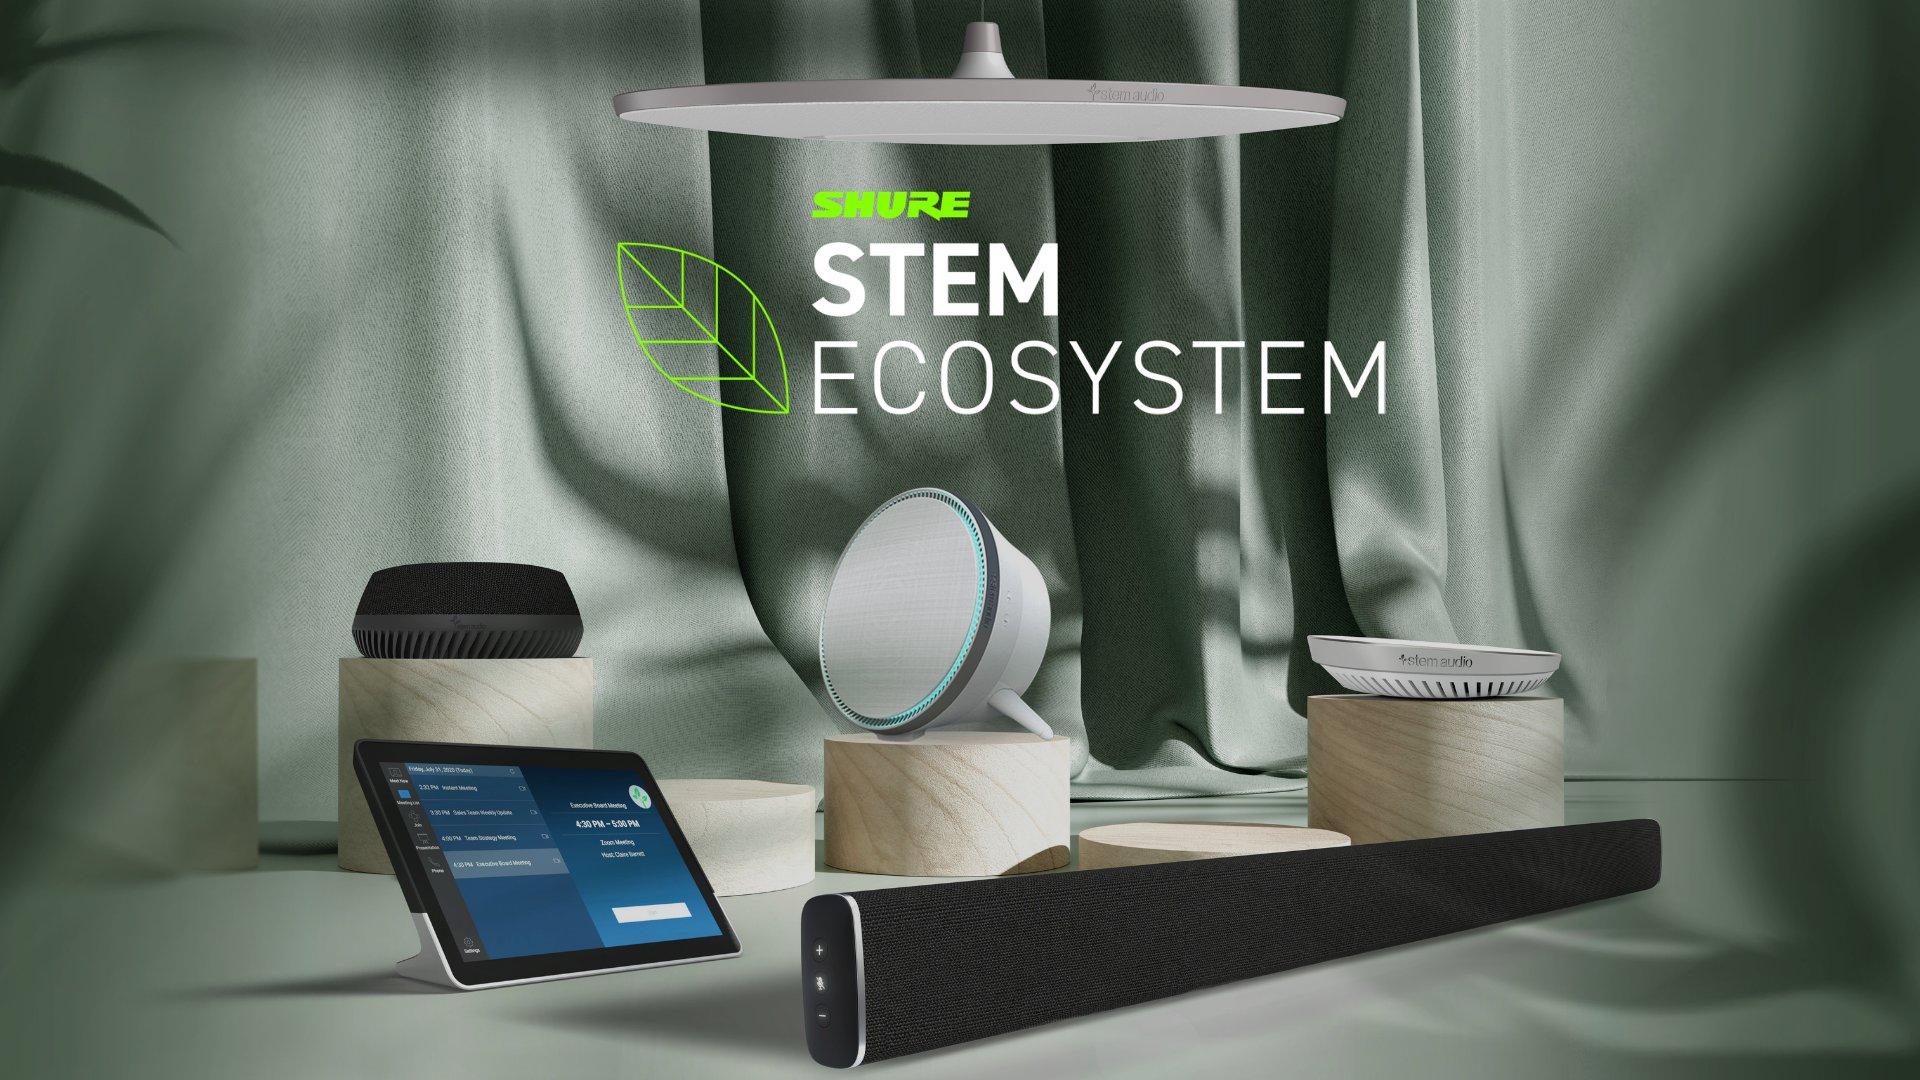 Stem Ecosystem (Foto: Shure)